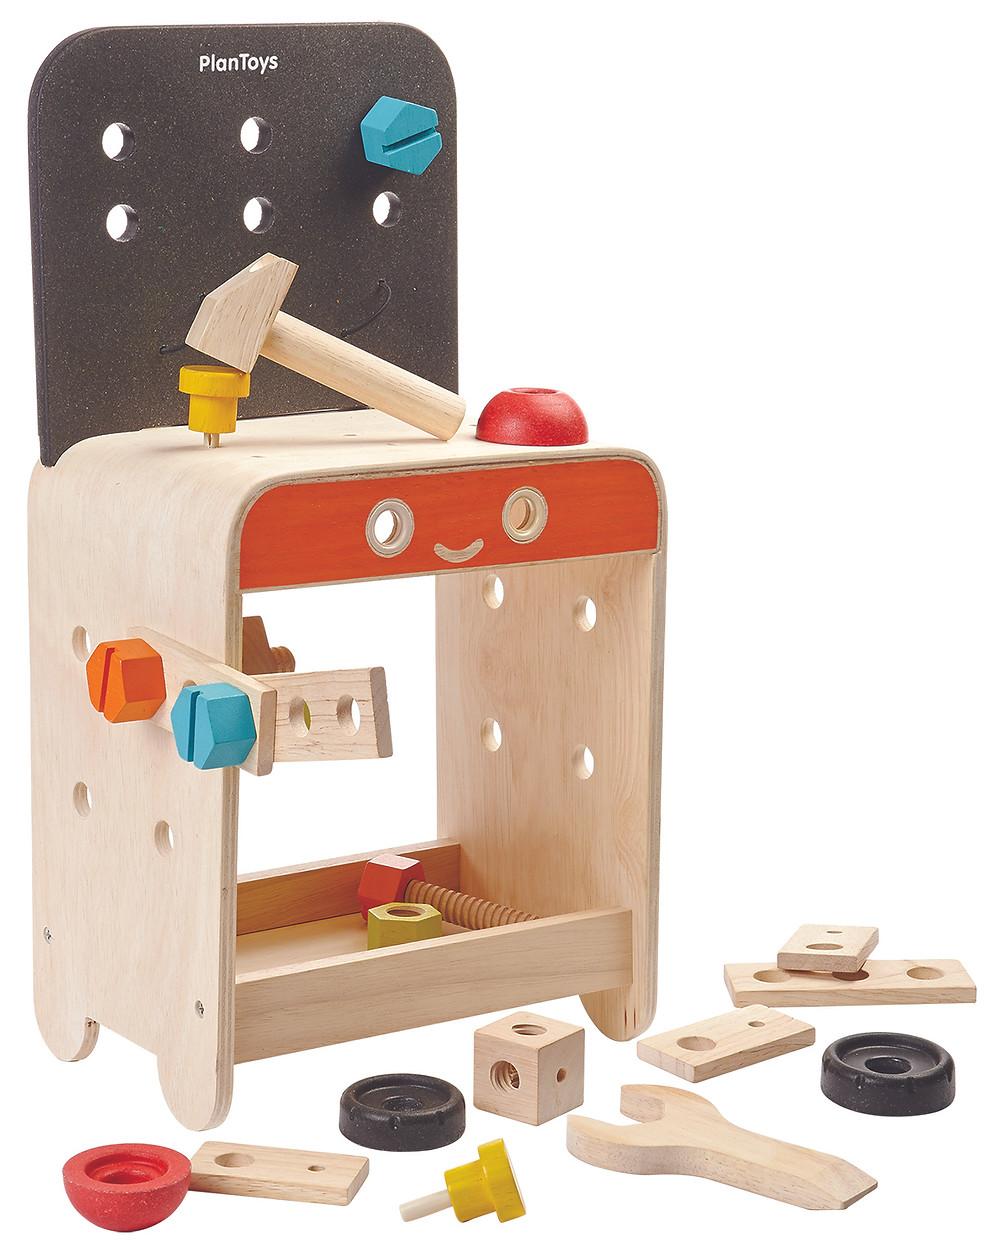 Plan Toys - Workbench